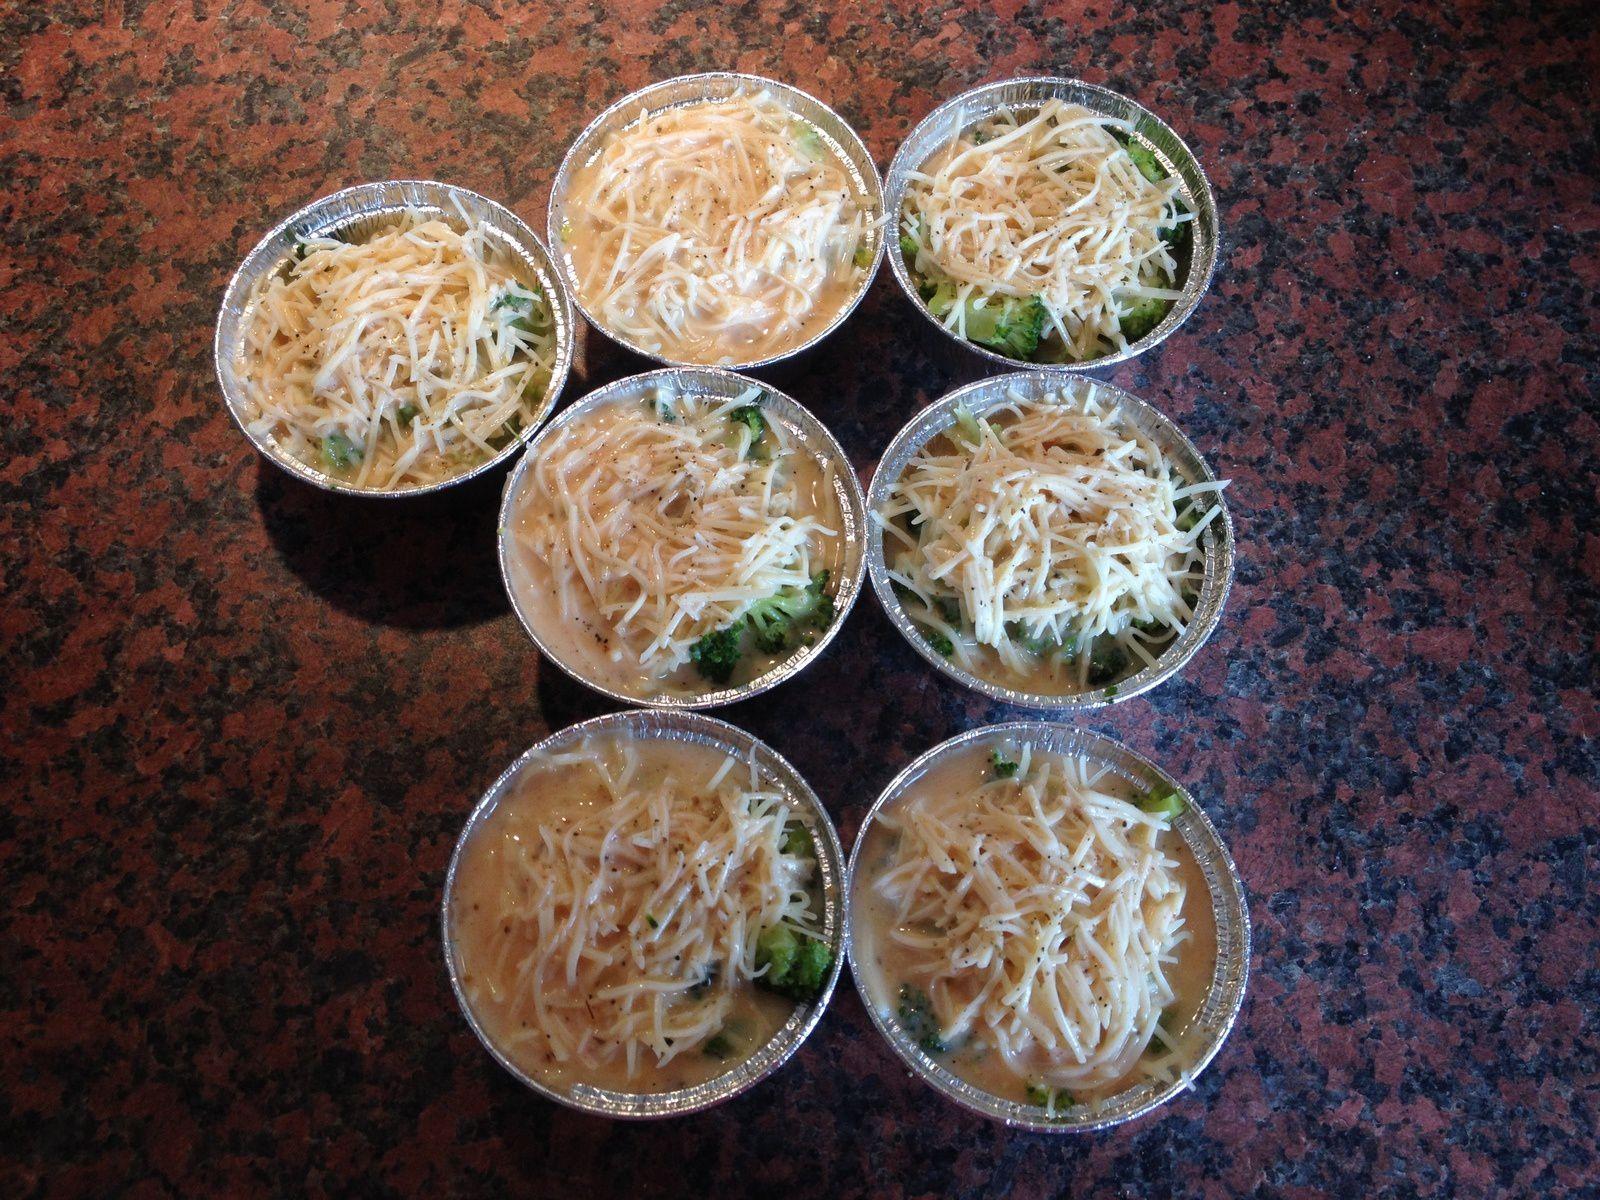 Petits flans de brocolis, au parika et origan